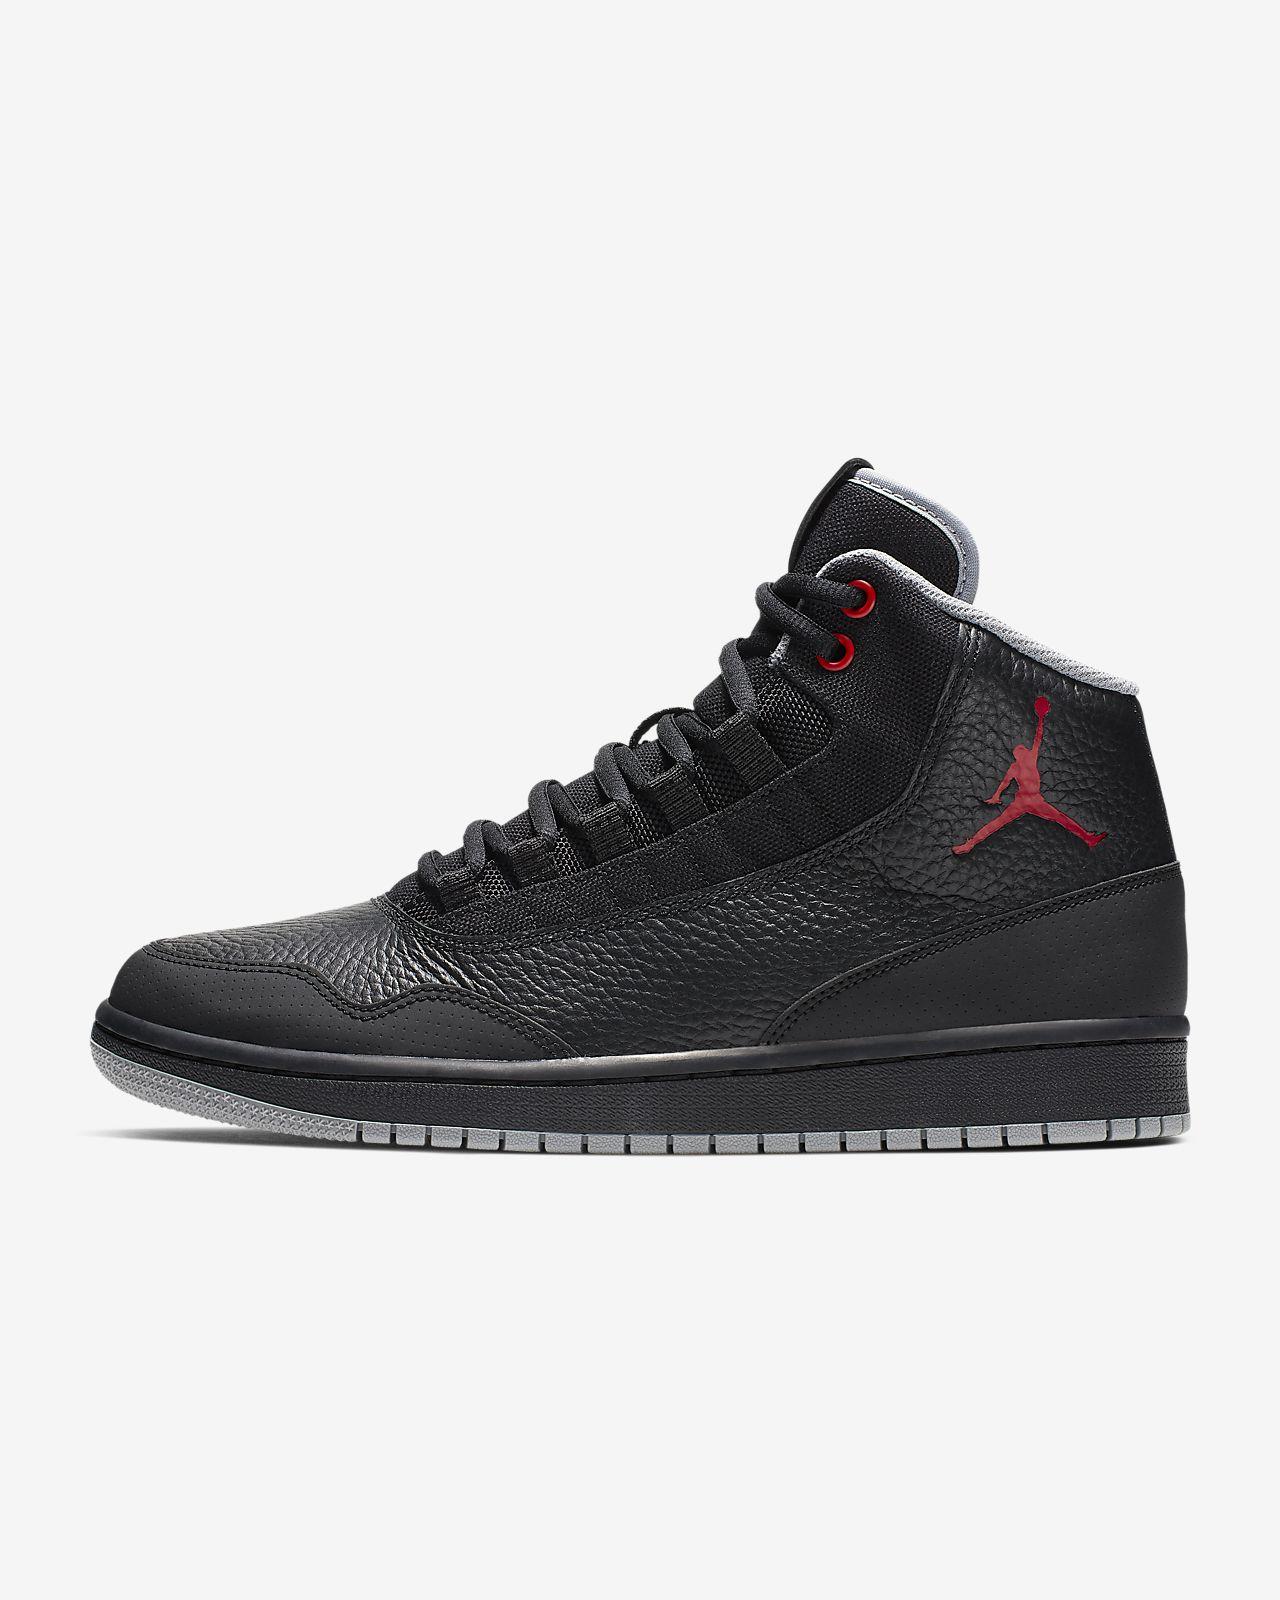 262e14af24cdd5 Low Resolution Jordan Executive Men s Shoe Jordan Executive Men s Shoe